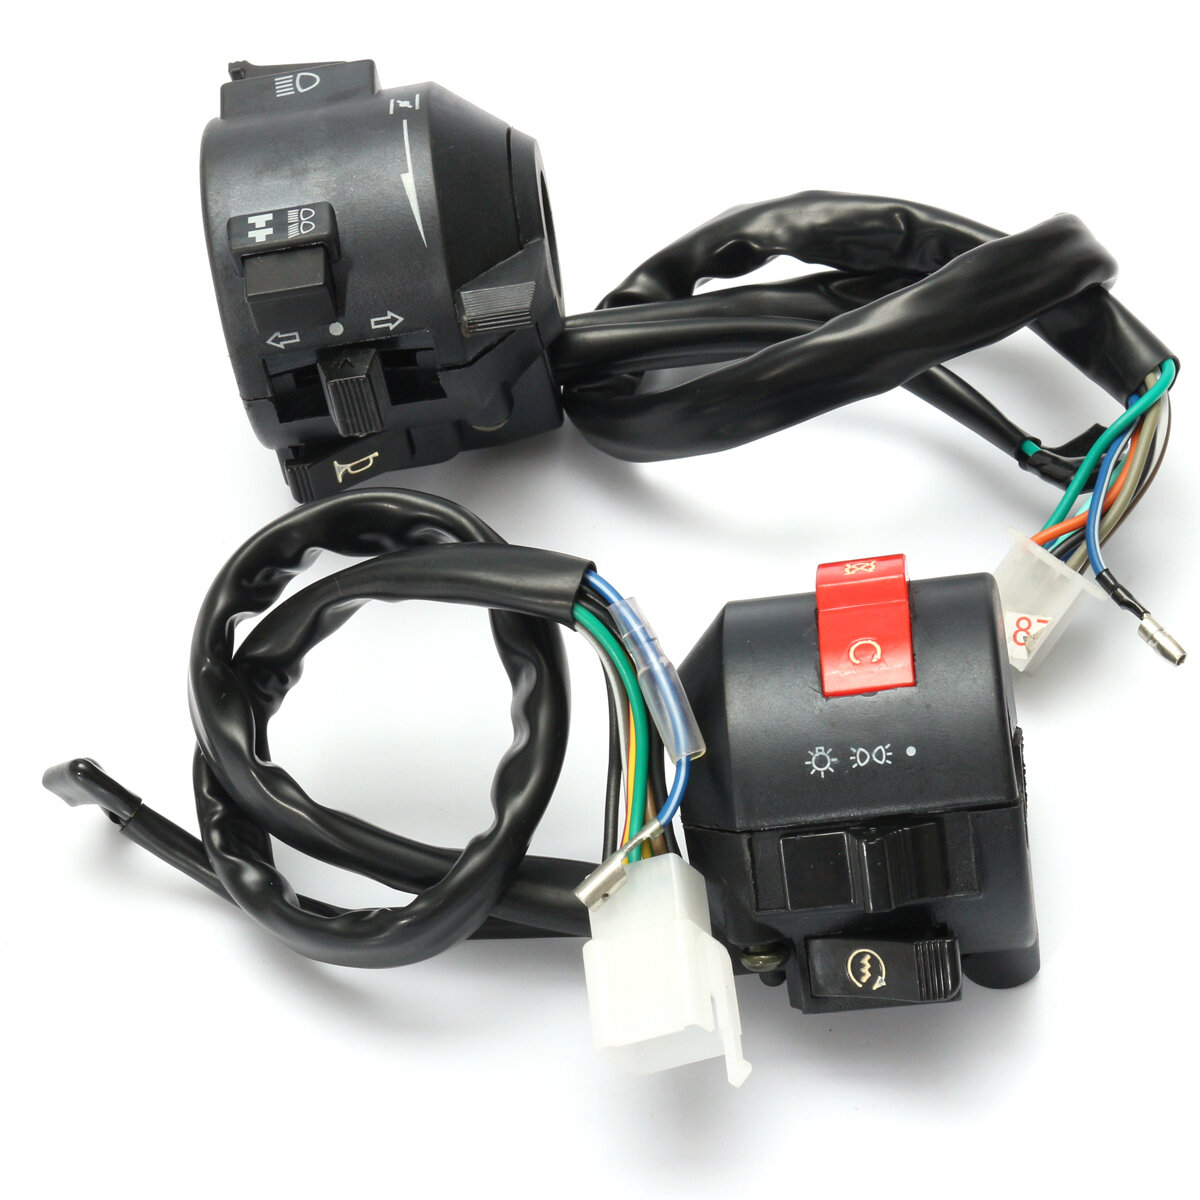 hight resolution of mini chopper headlight wiring diagram kill switch for a horn mini chopper headlight wiring diagram kill switch for a horn